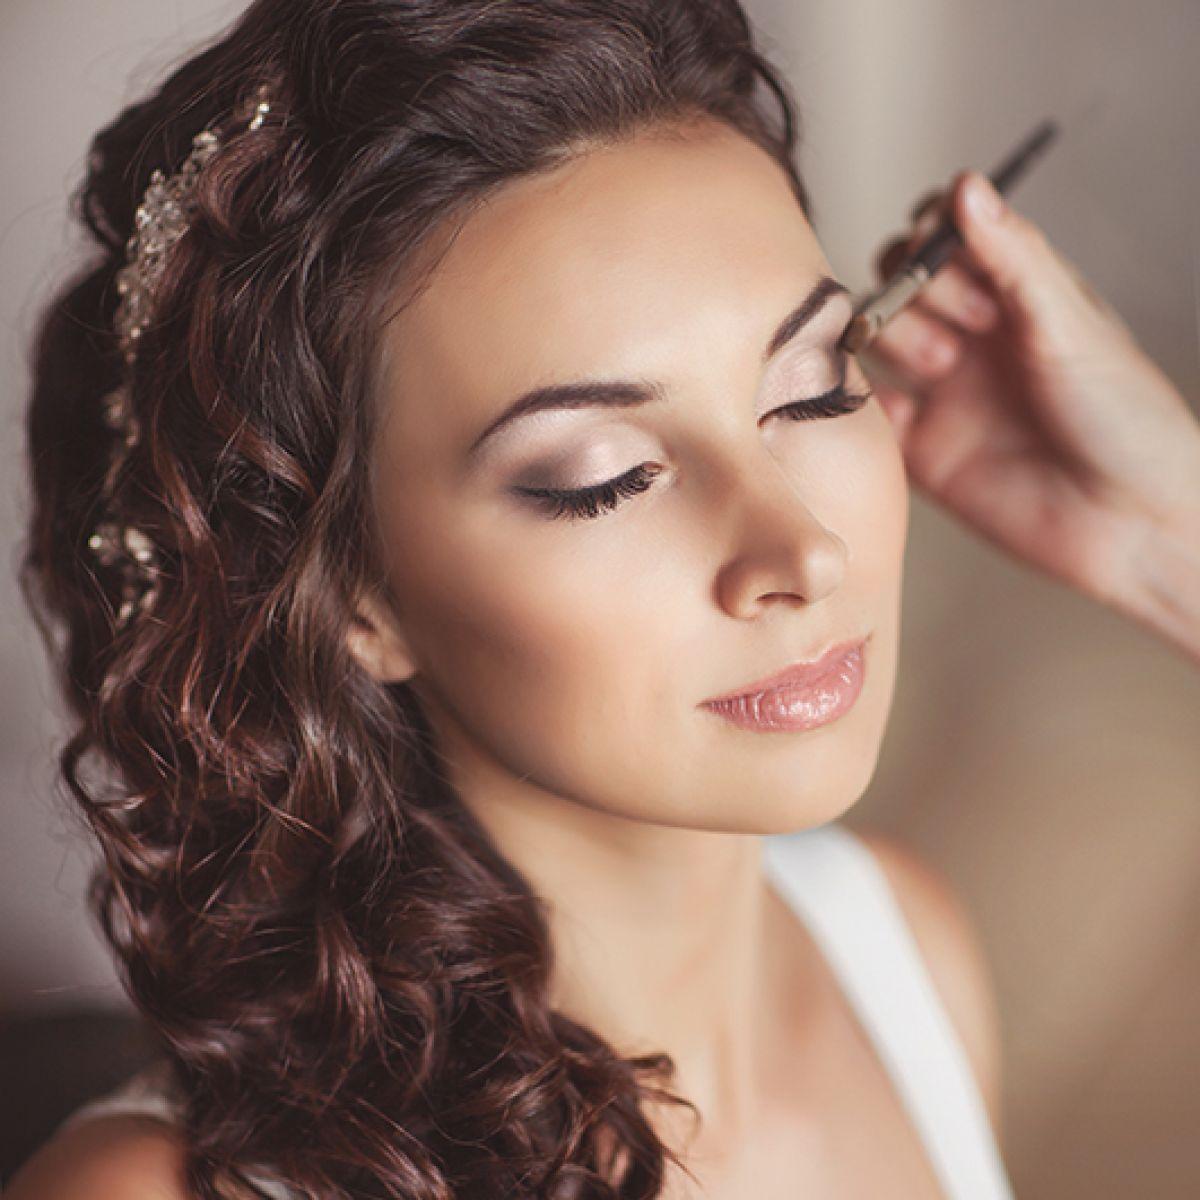 Maquillage à Mérignac (33) Par Sylvie - Estheca